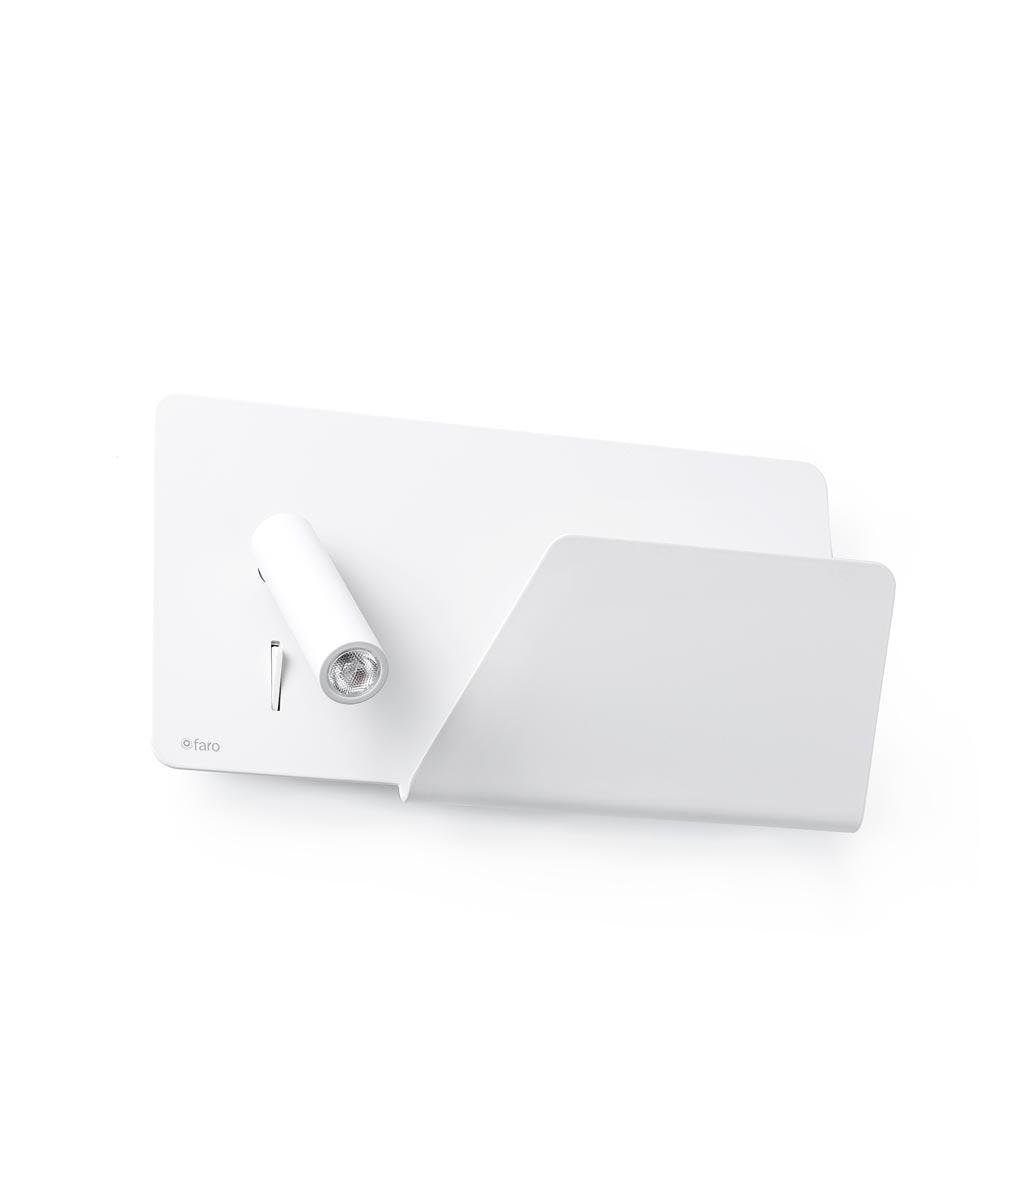 Aplique blanco derecha SUAU USB